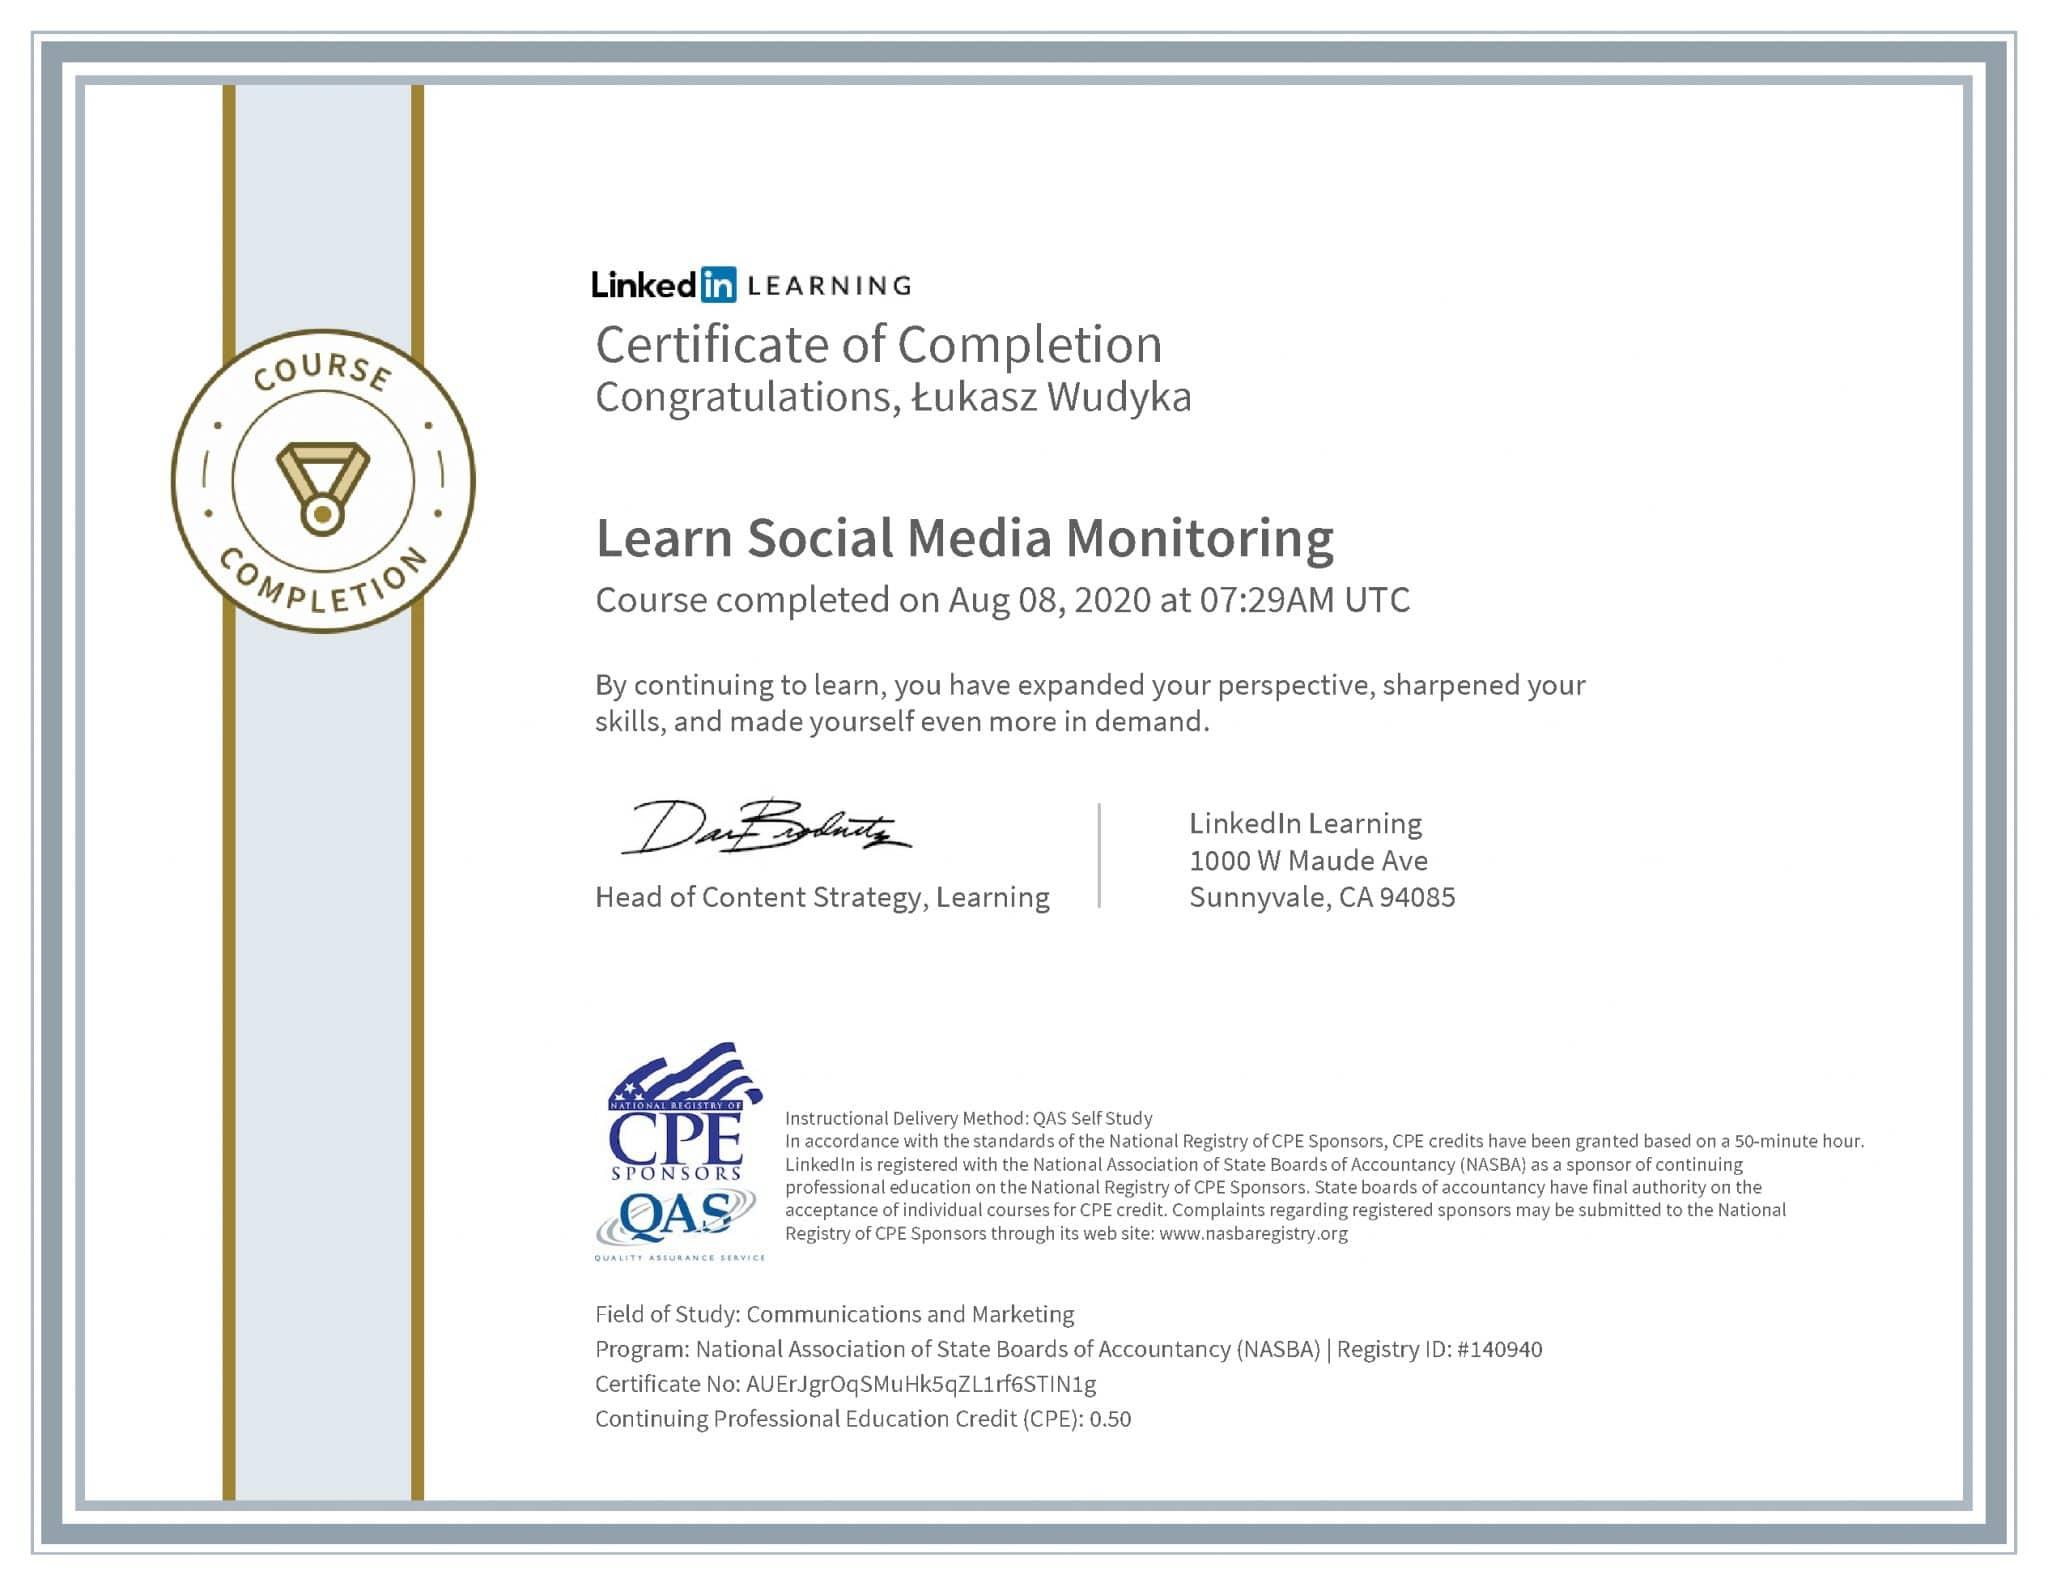 Łukasz Wudyka certyfikat LinkedIn Learn Social Media Monitoring NASBA